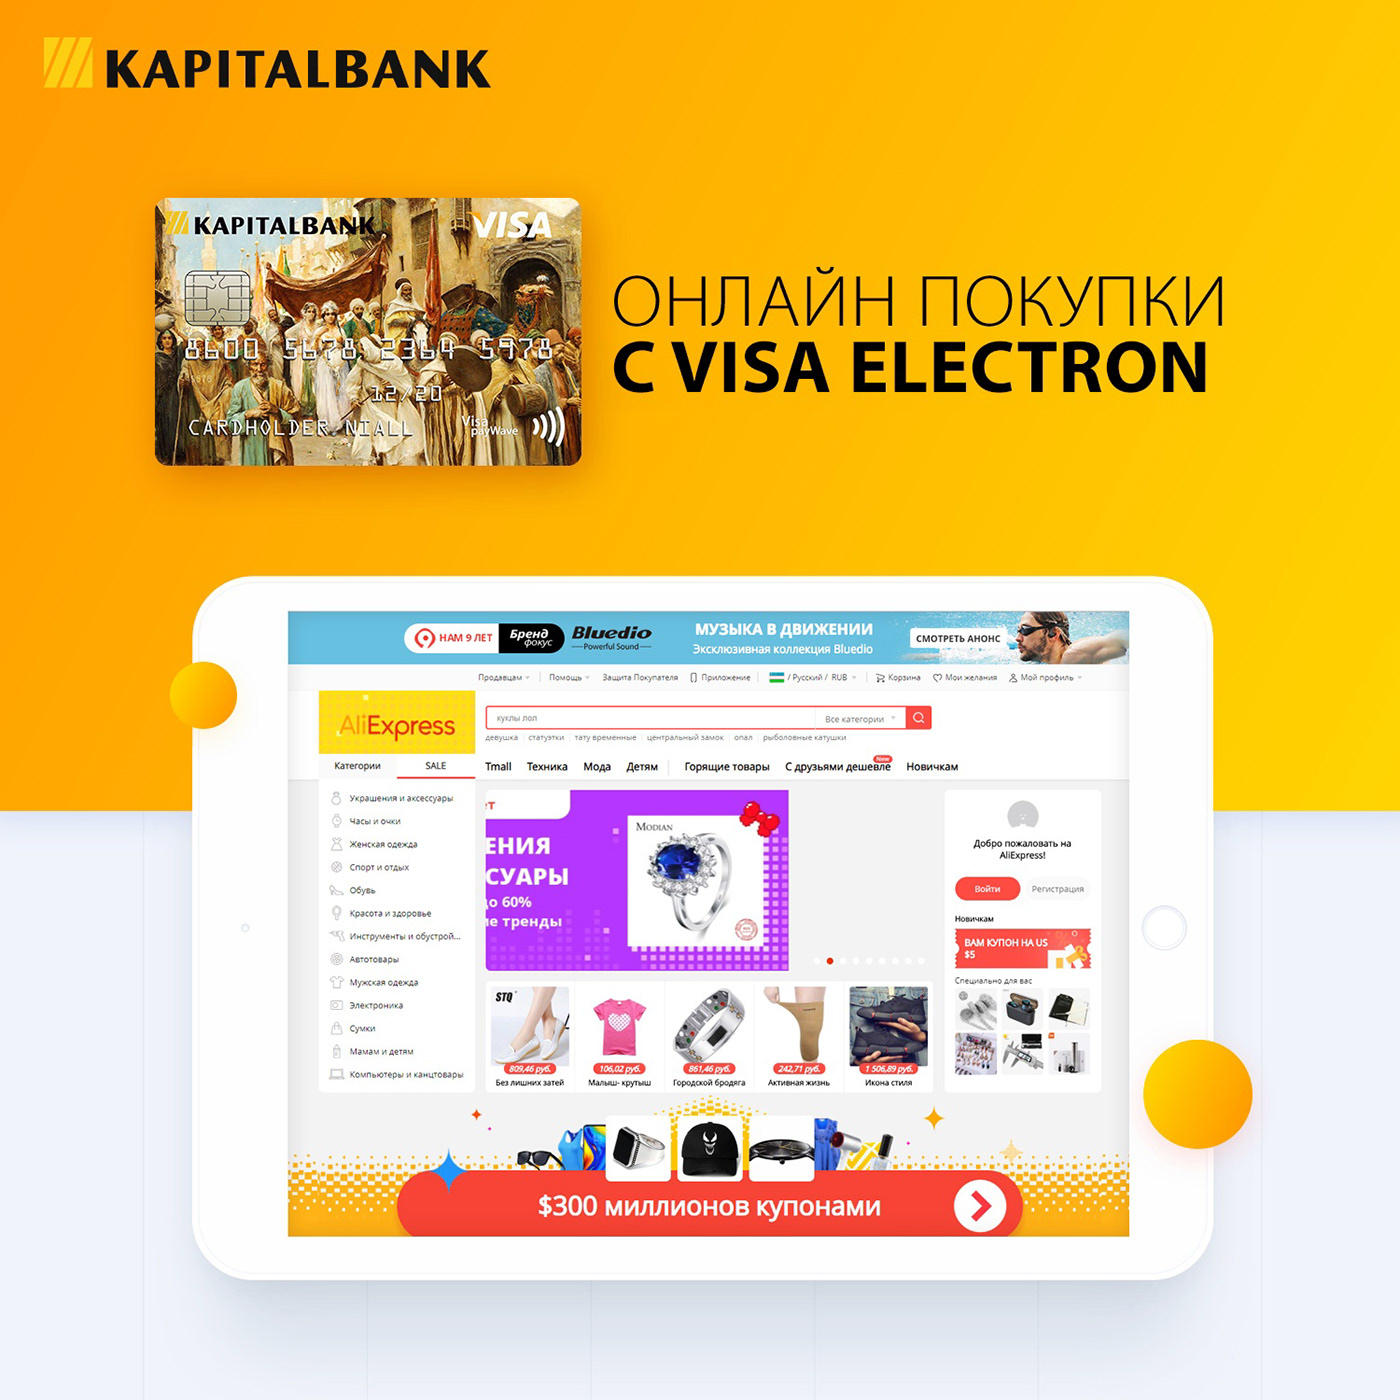 SMM Samsa Agency samsa advertisement Visa Bank social media kapitalbank  Facebook ads